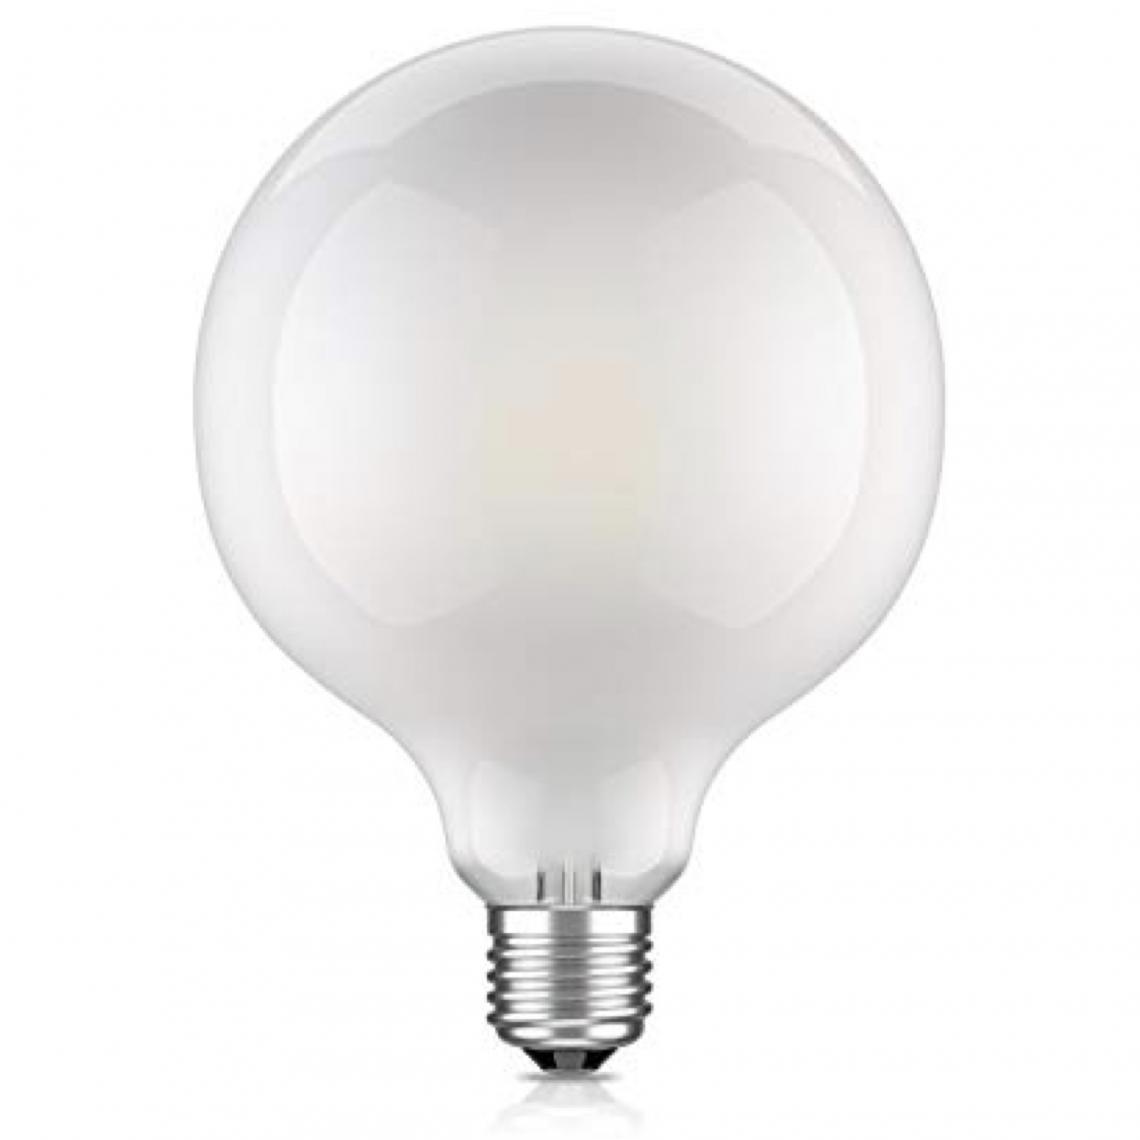 Promo : Ampoule LED Globe Blanc 4W Dimmable ROXANE